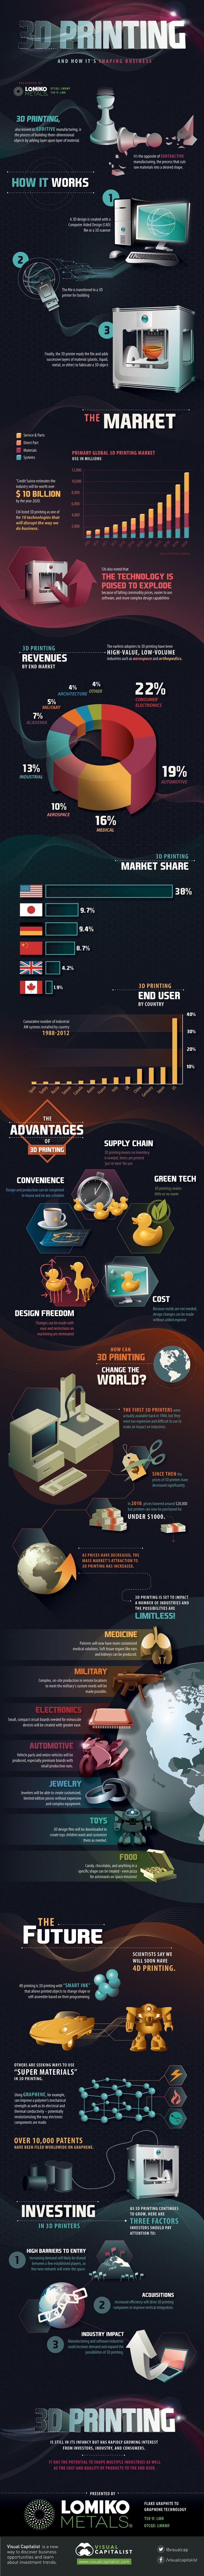 18 best 3d printing images on Pinterest | DIY, Advertising ideas ...